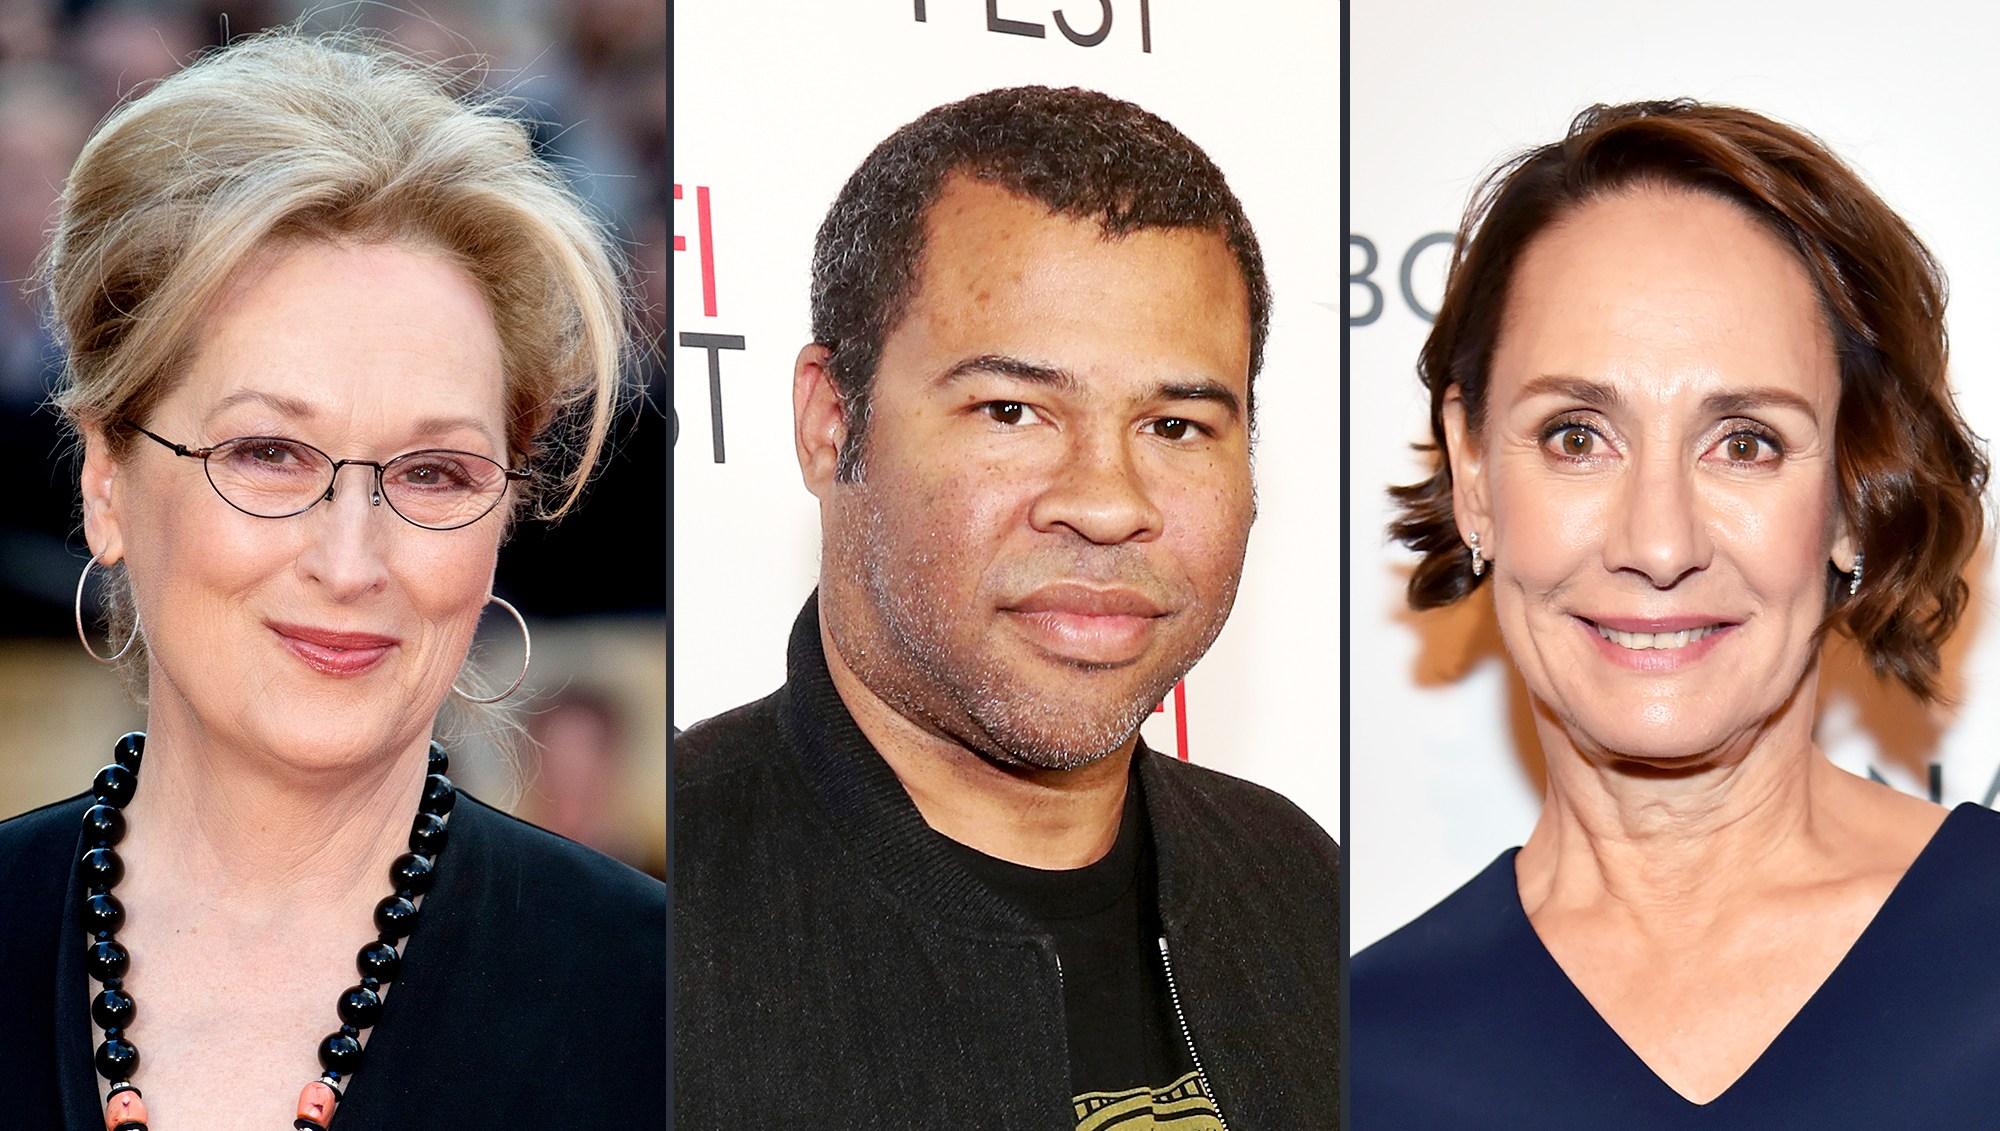 Meryl Streep Jordan Peele Laurie Metcalf Oscar Nomination Reactions